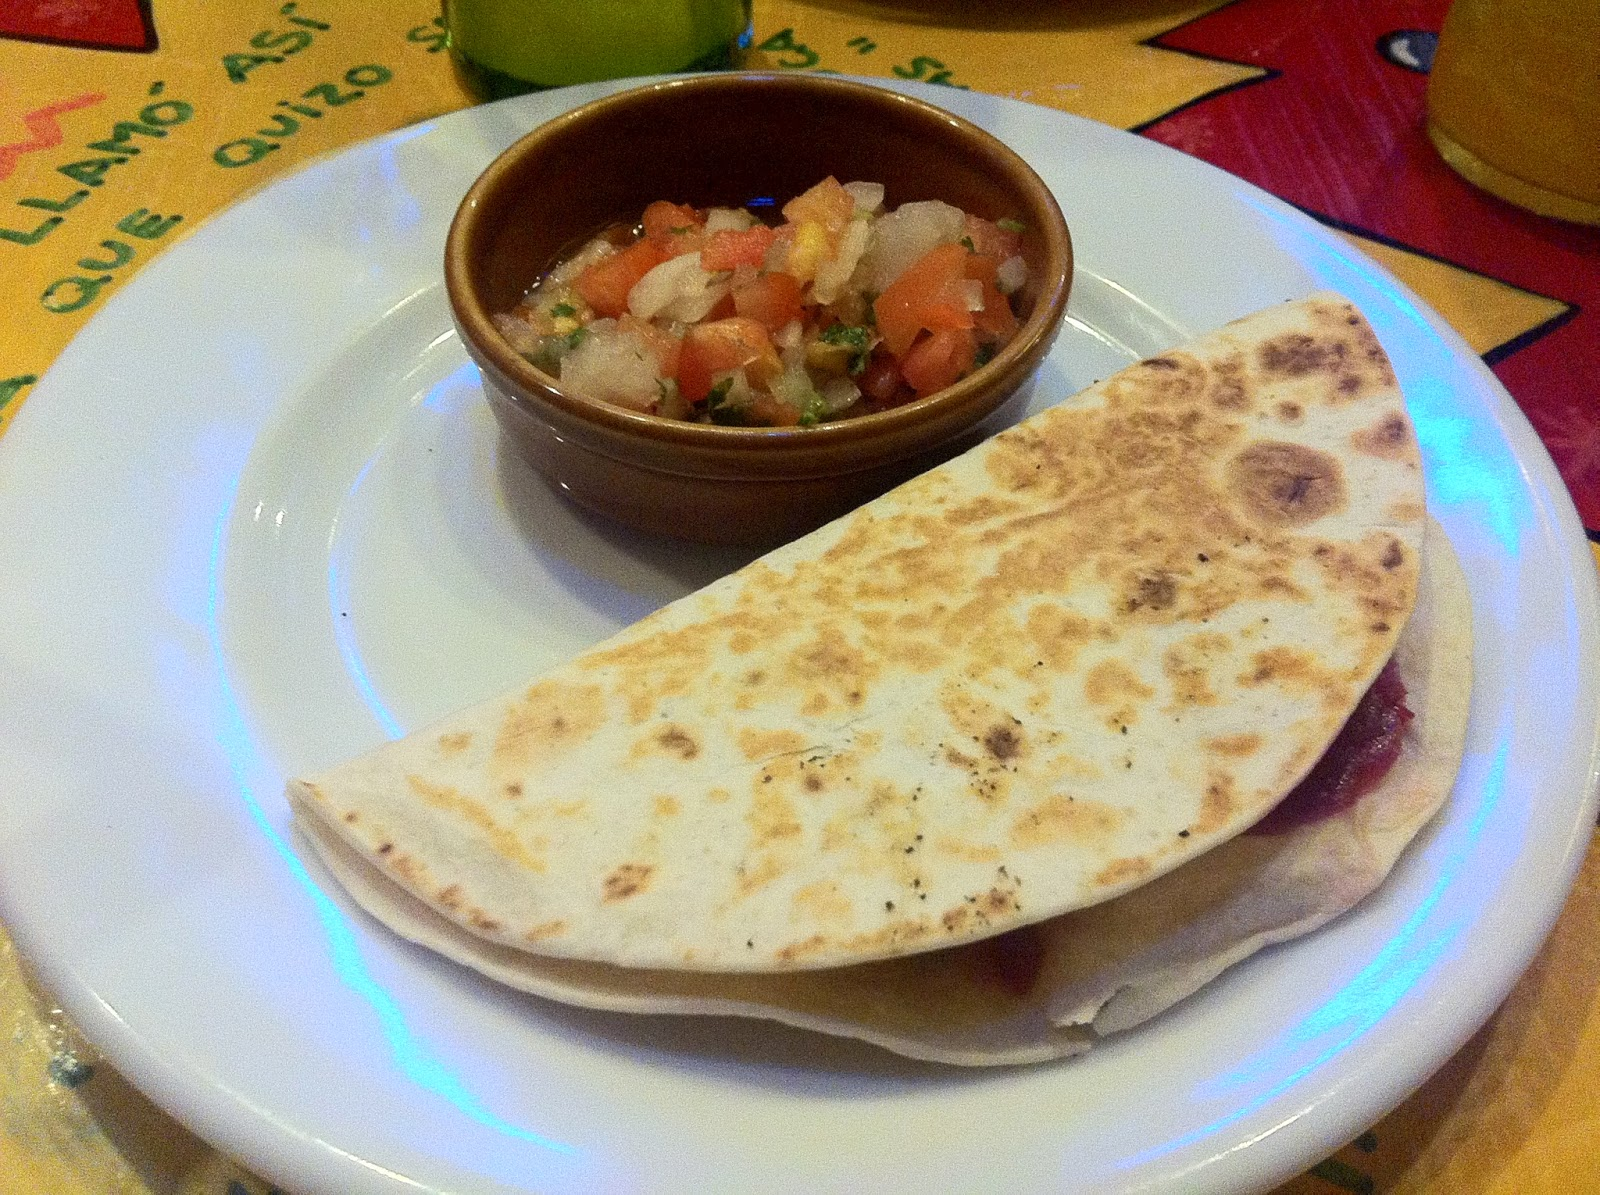 Las Tacos Gringas Food Truck